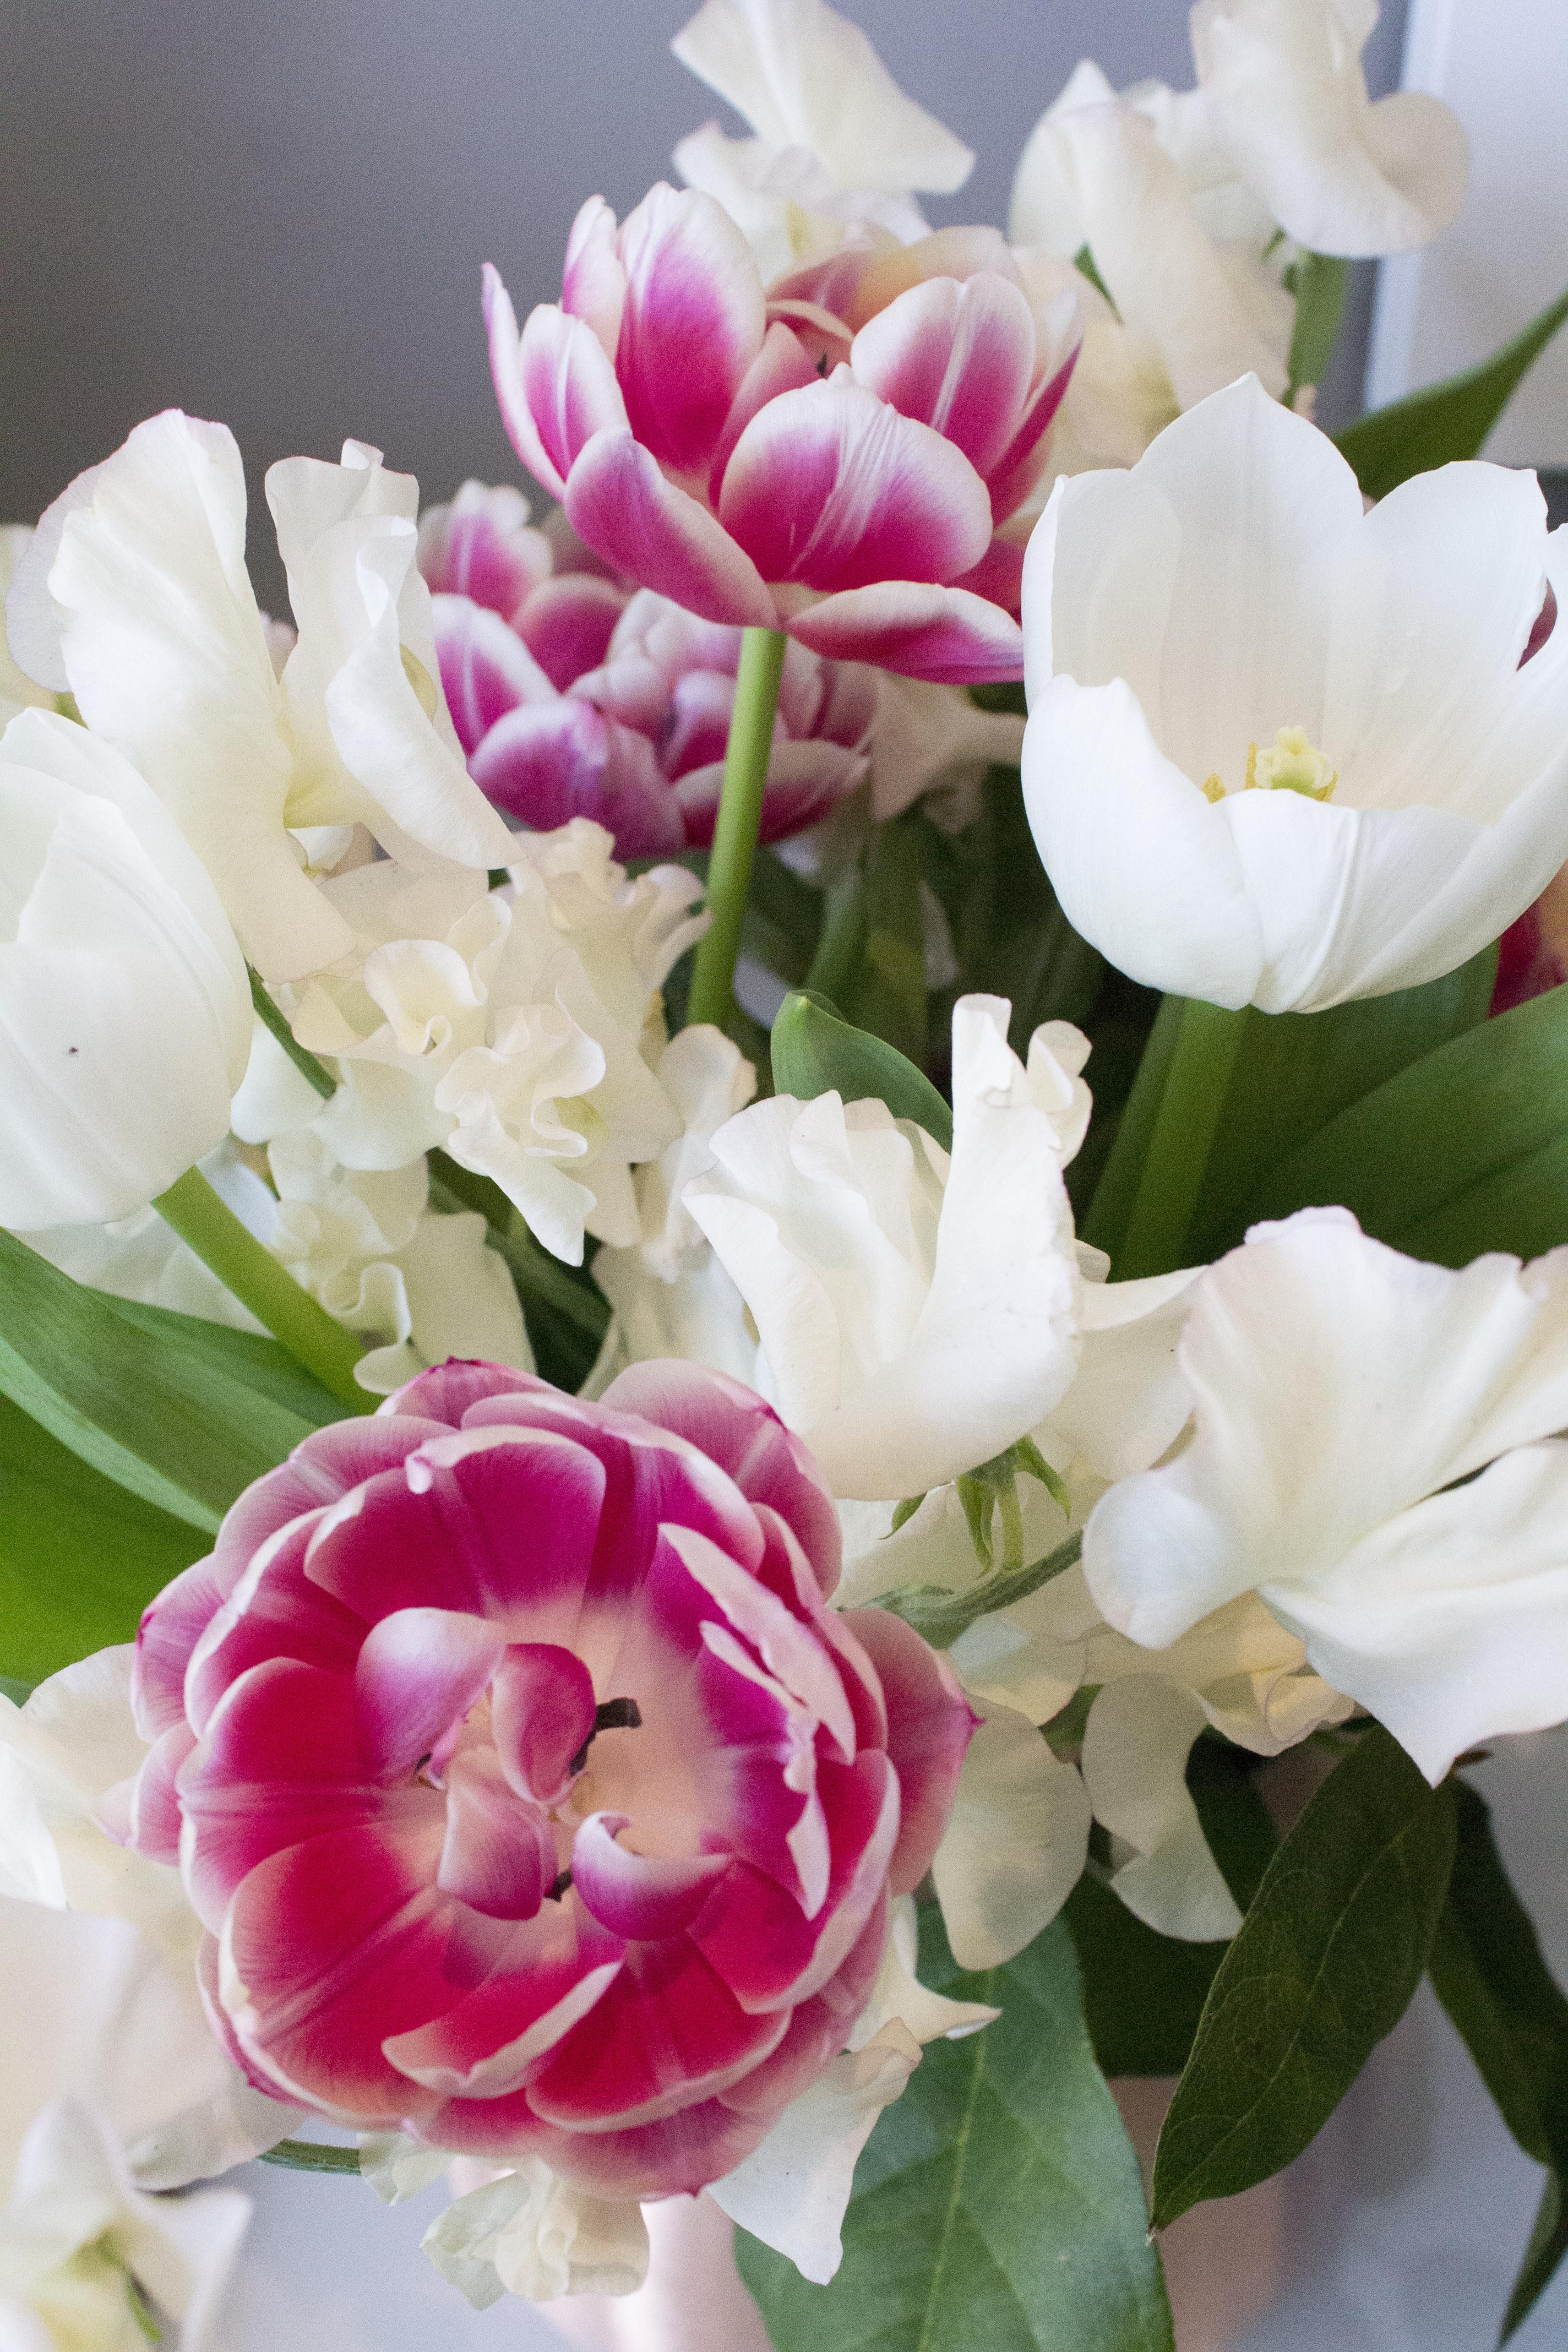 Tulips-photo-by-Geraldine-Tan-Little-Big-Bell